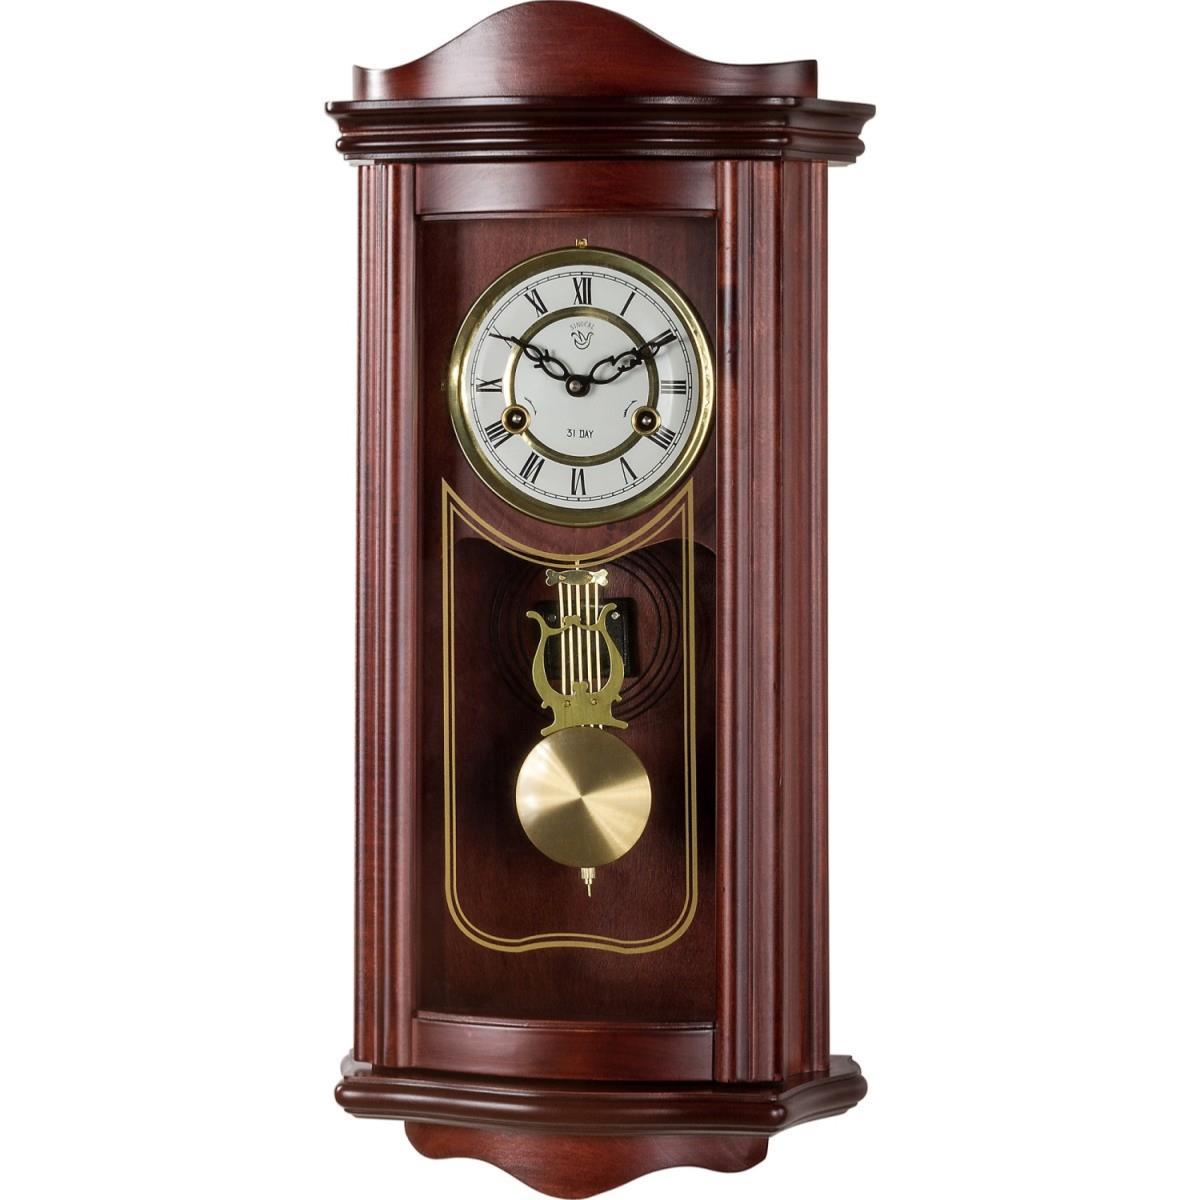 horloge pendule murale 63 cm style ancien acajou. Black Bedroom Furniture Sets. Home Design Ideas